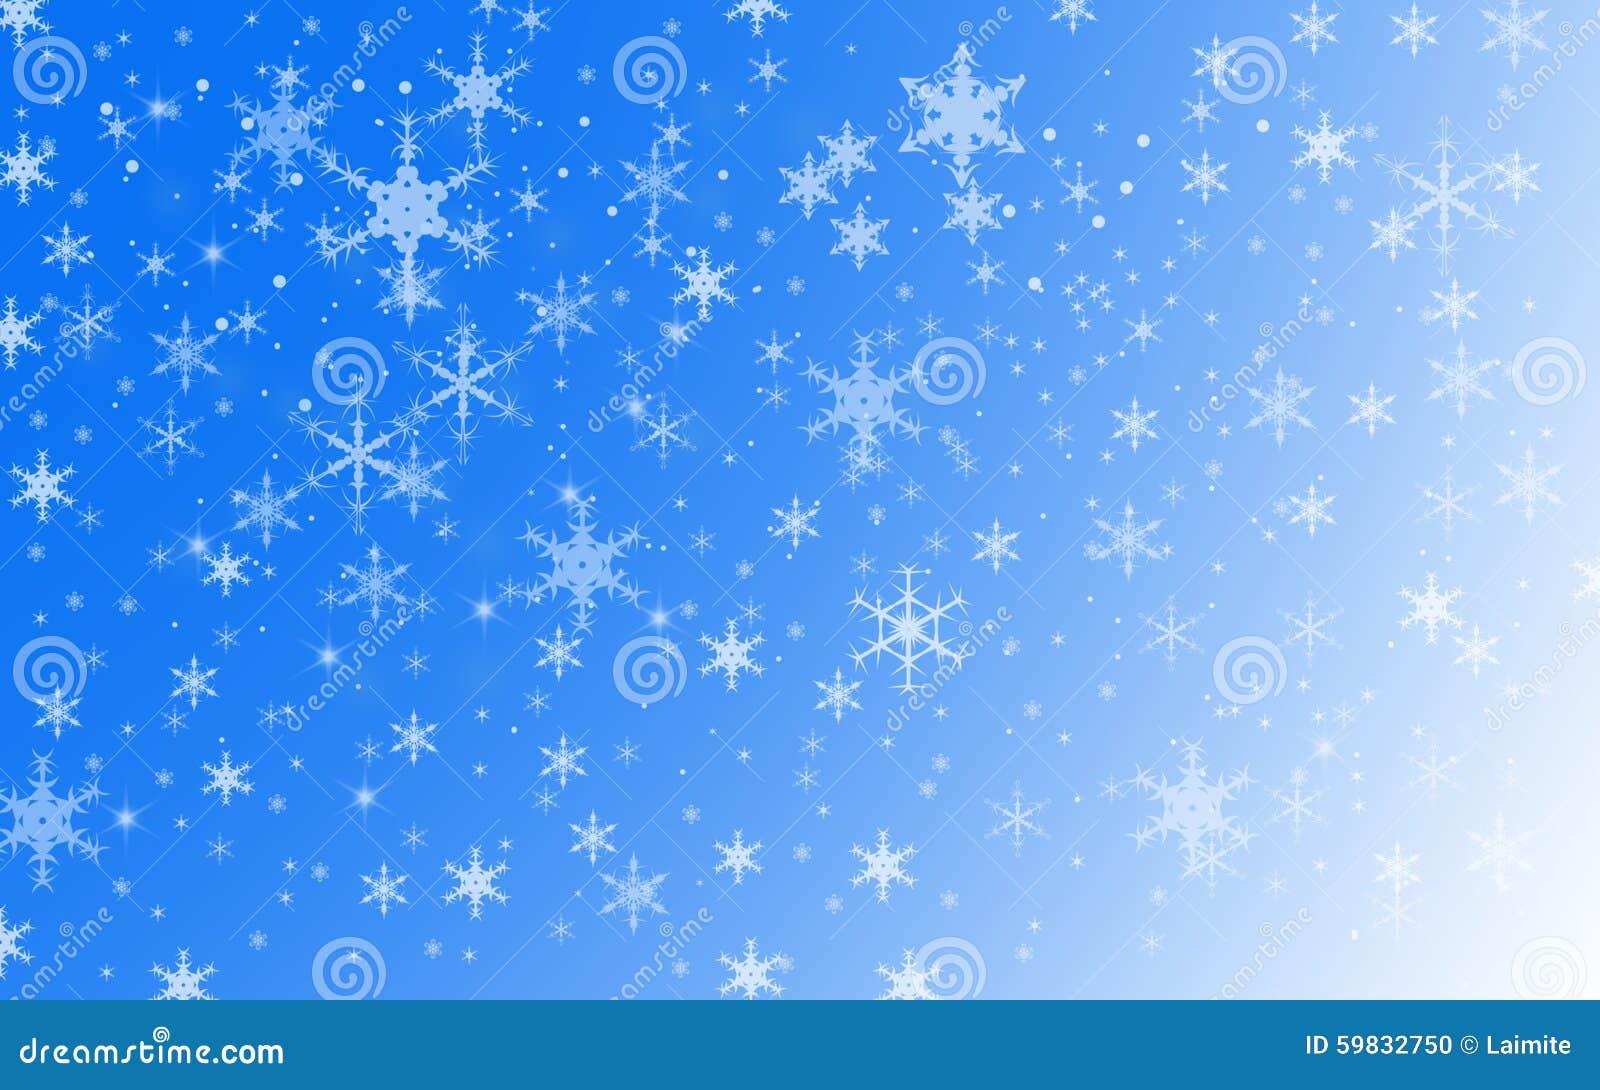 Winter Christmas Backdrops